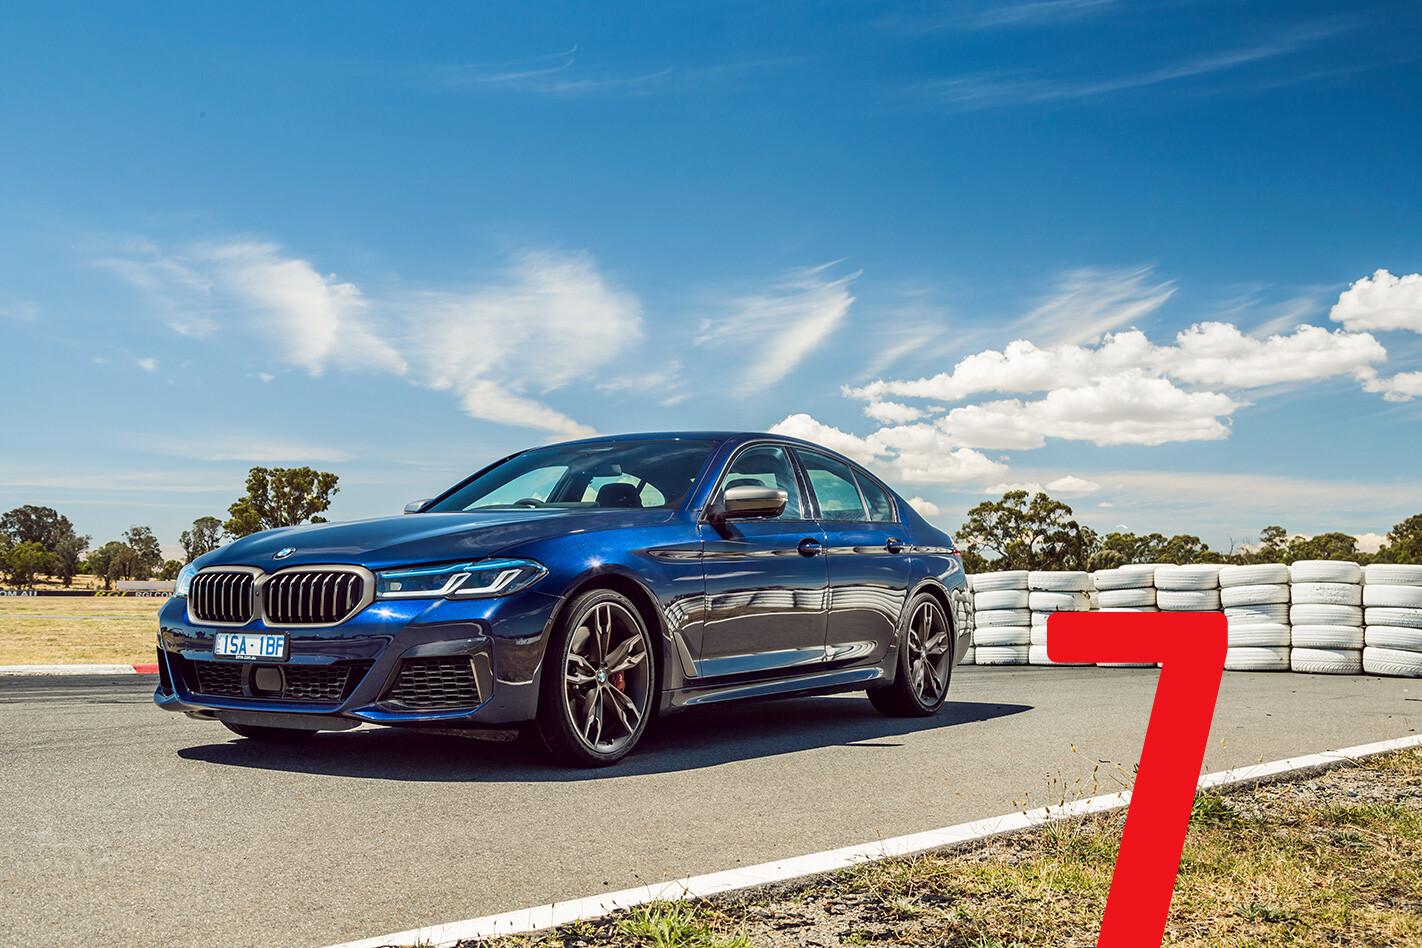 BMW M 550 I PCOTY 7 Cover MAIN Jpg